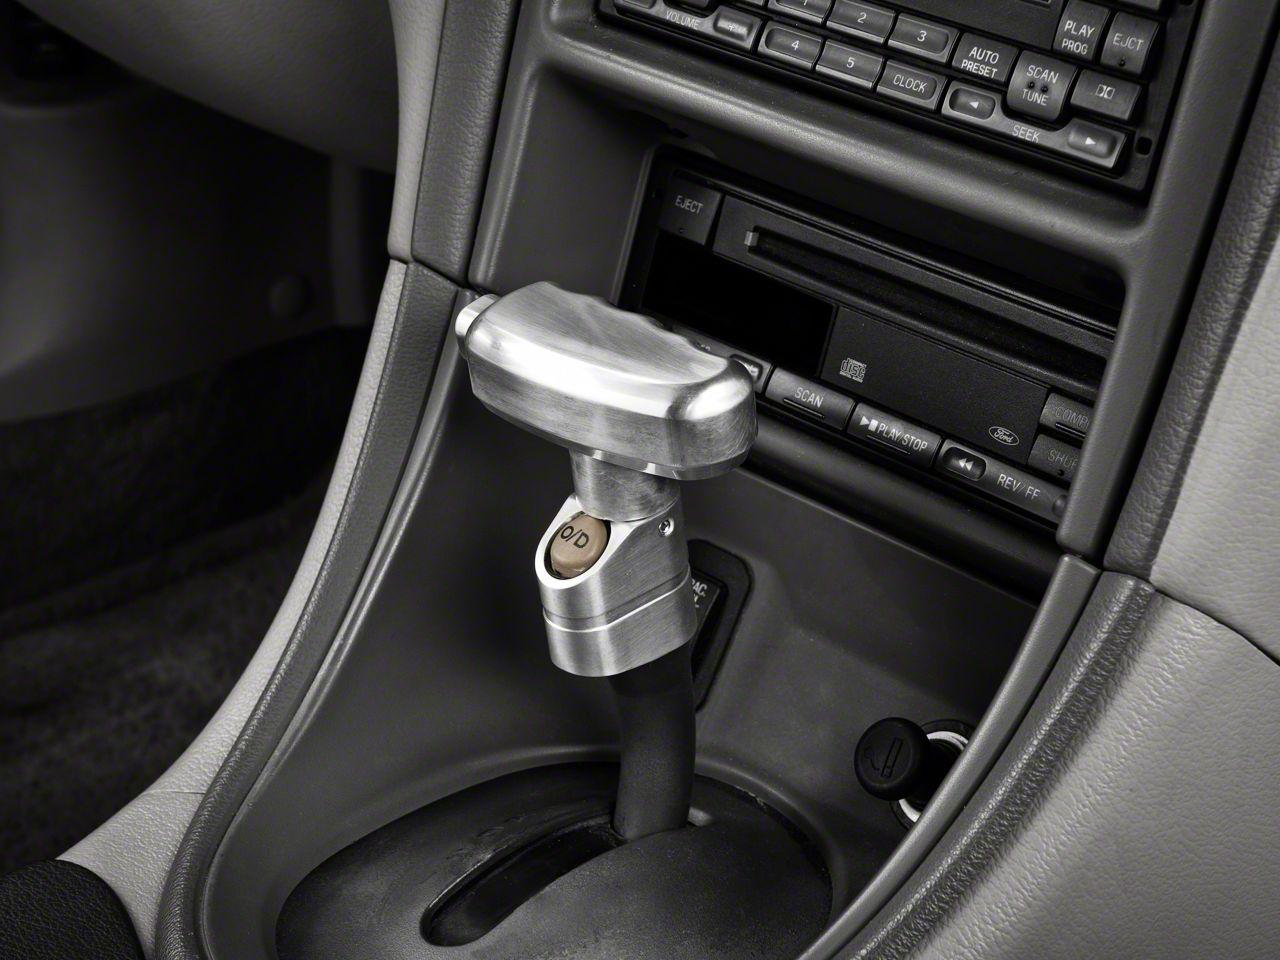 Modern Billet Mustang Billet T Handle Shift Knob 16179 87 04 W Automatic Transmission